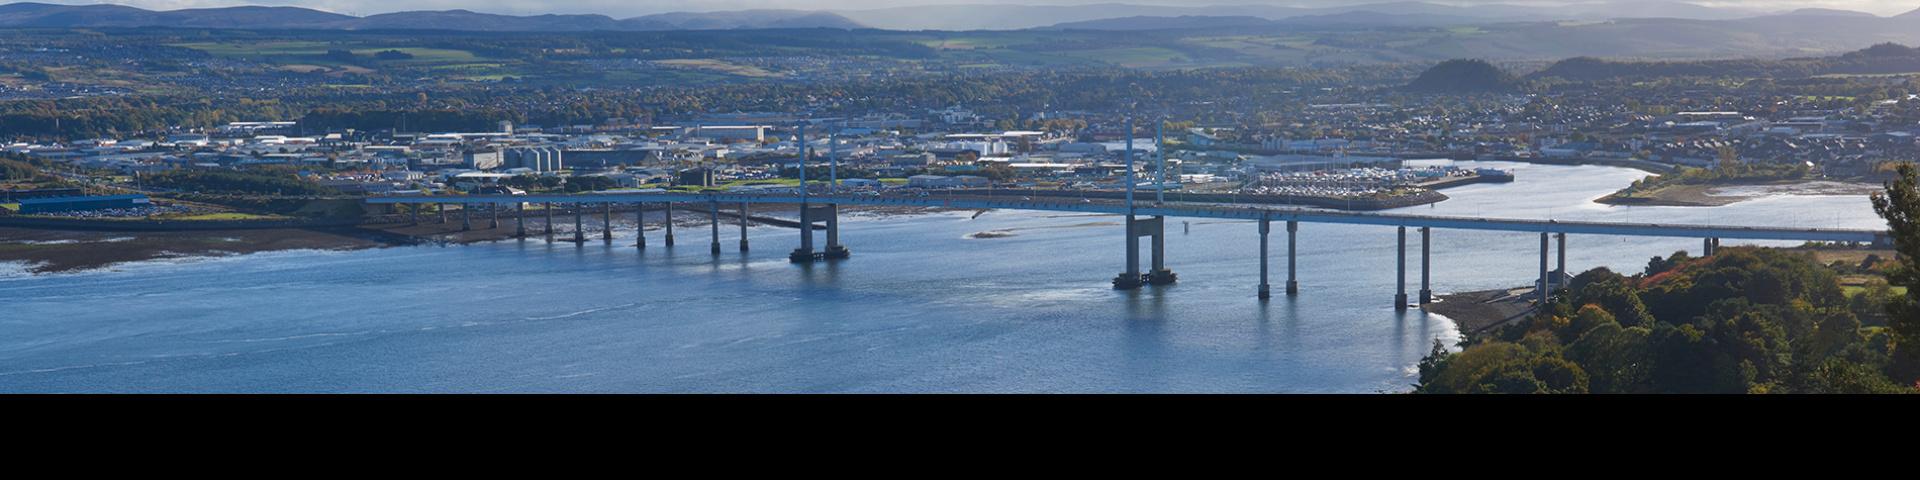 Kessock Bridge Inverness